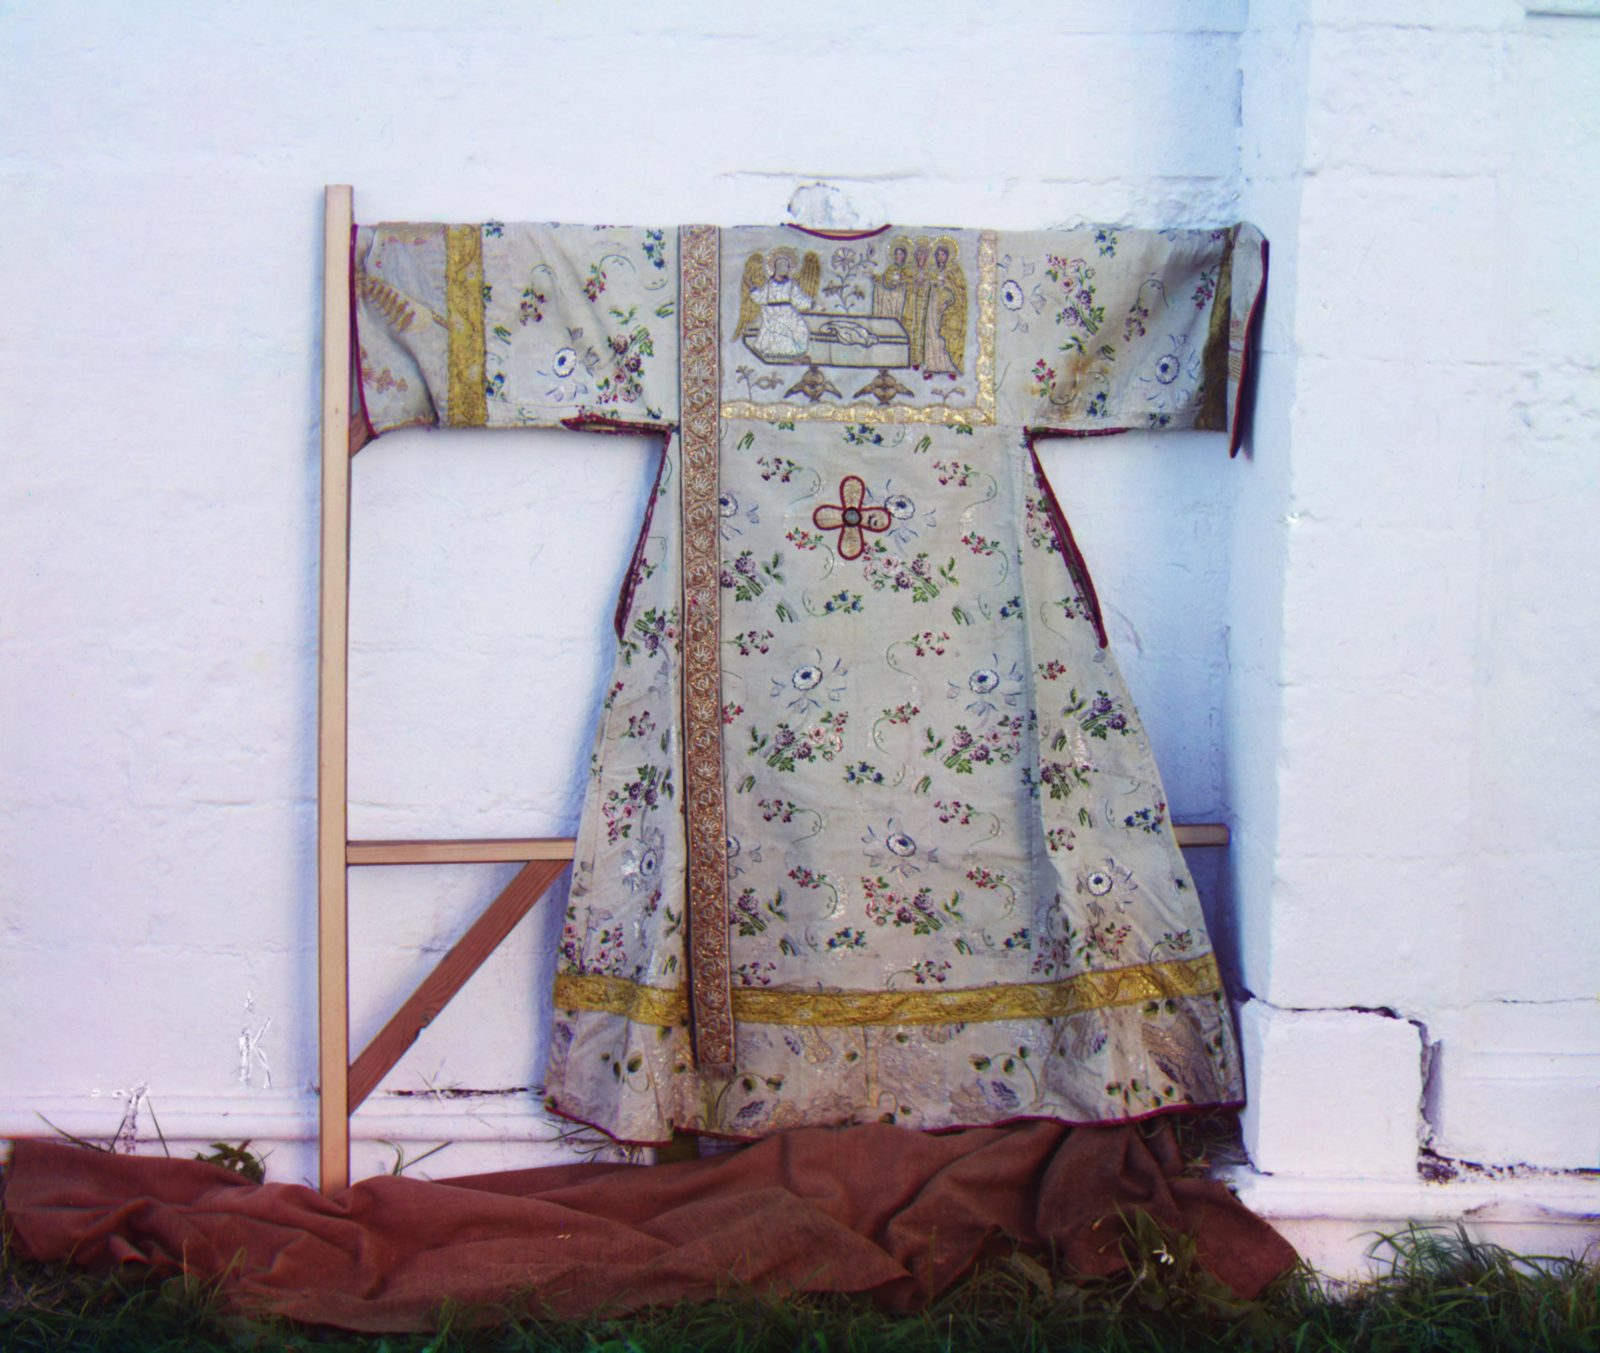 Stikherry, sewn by the princesses. Assumption Monastery. Alexandrov